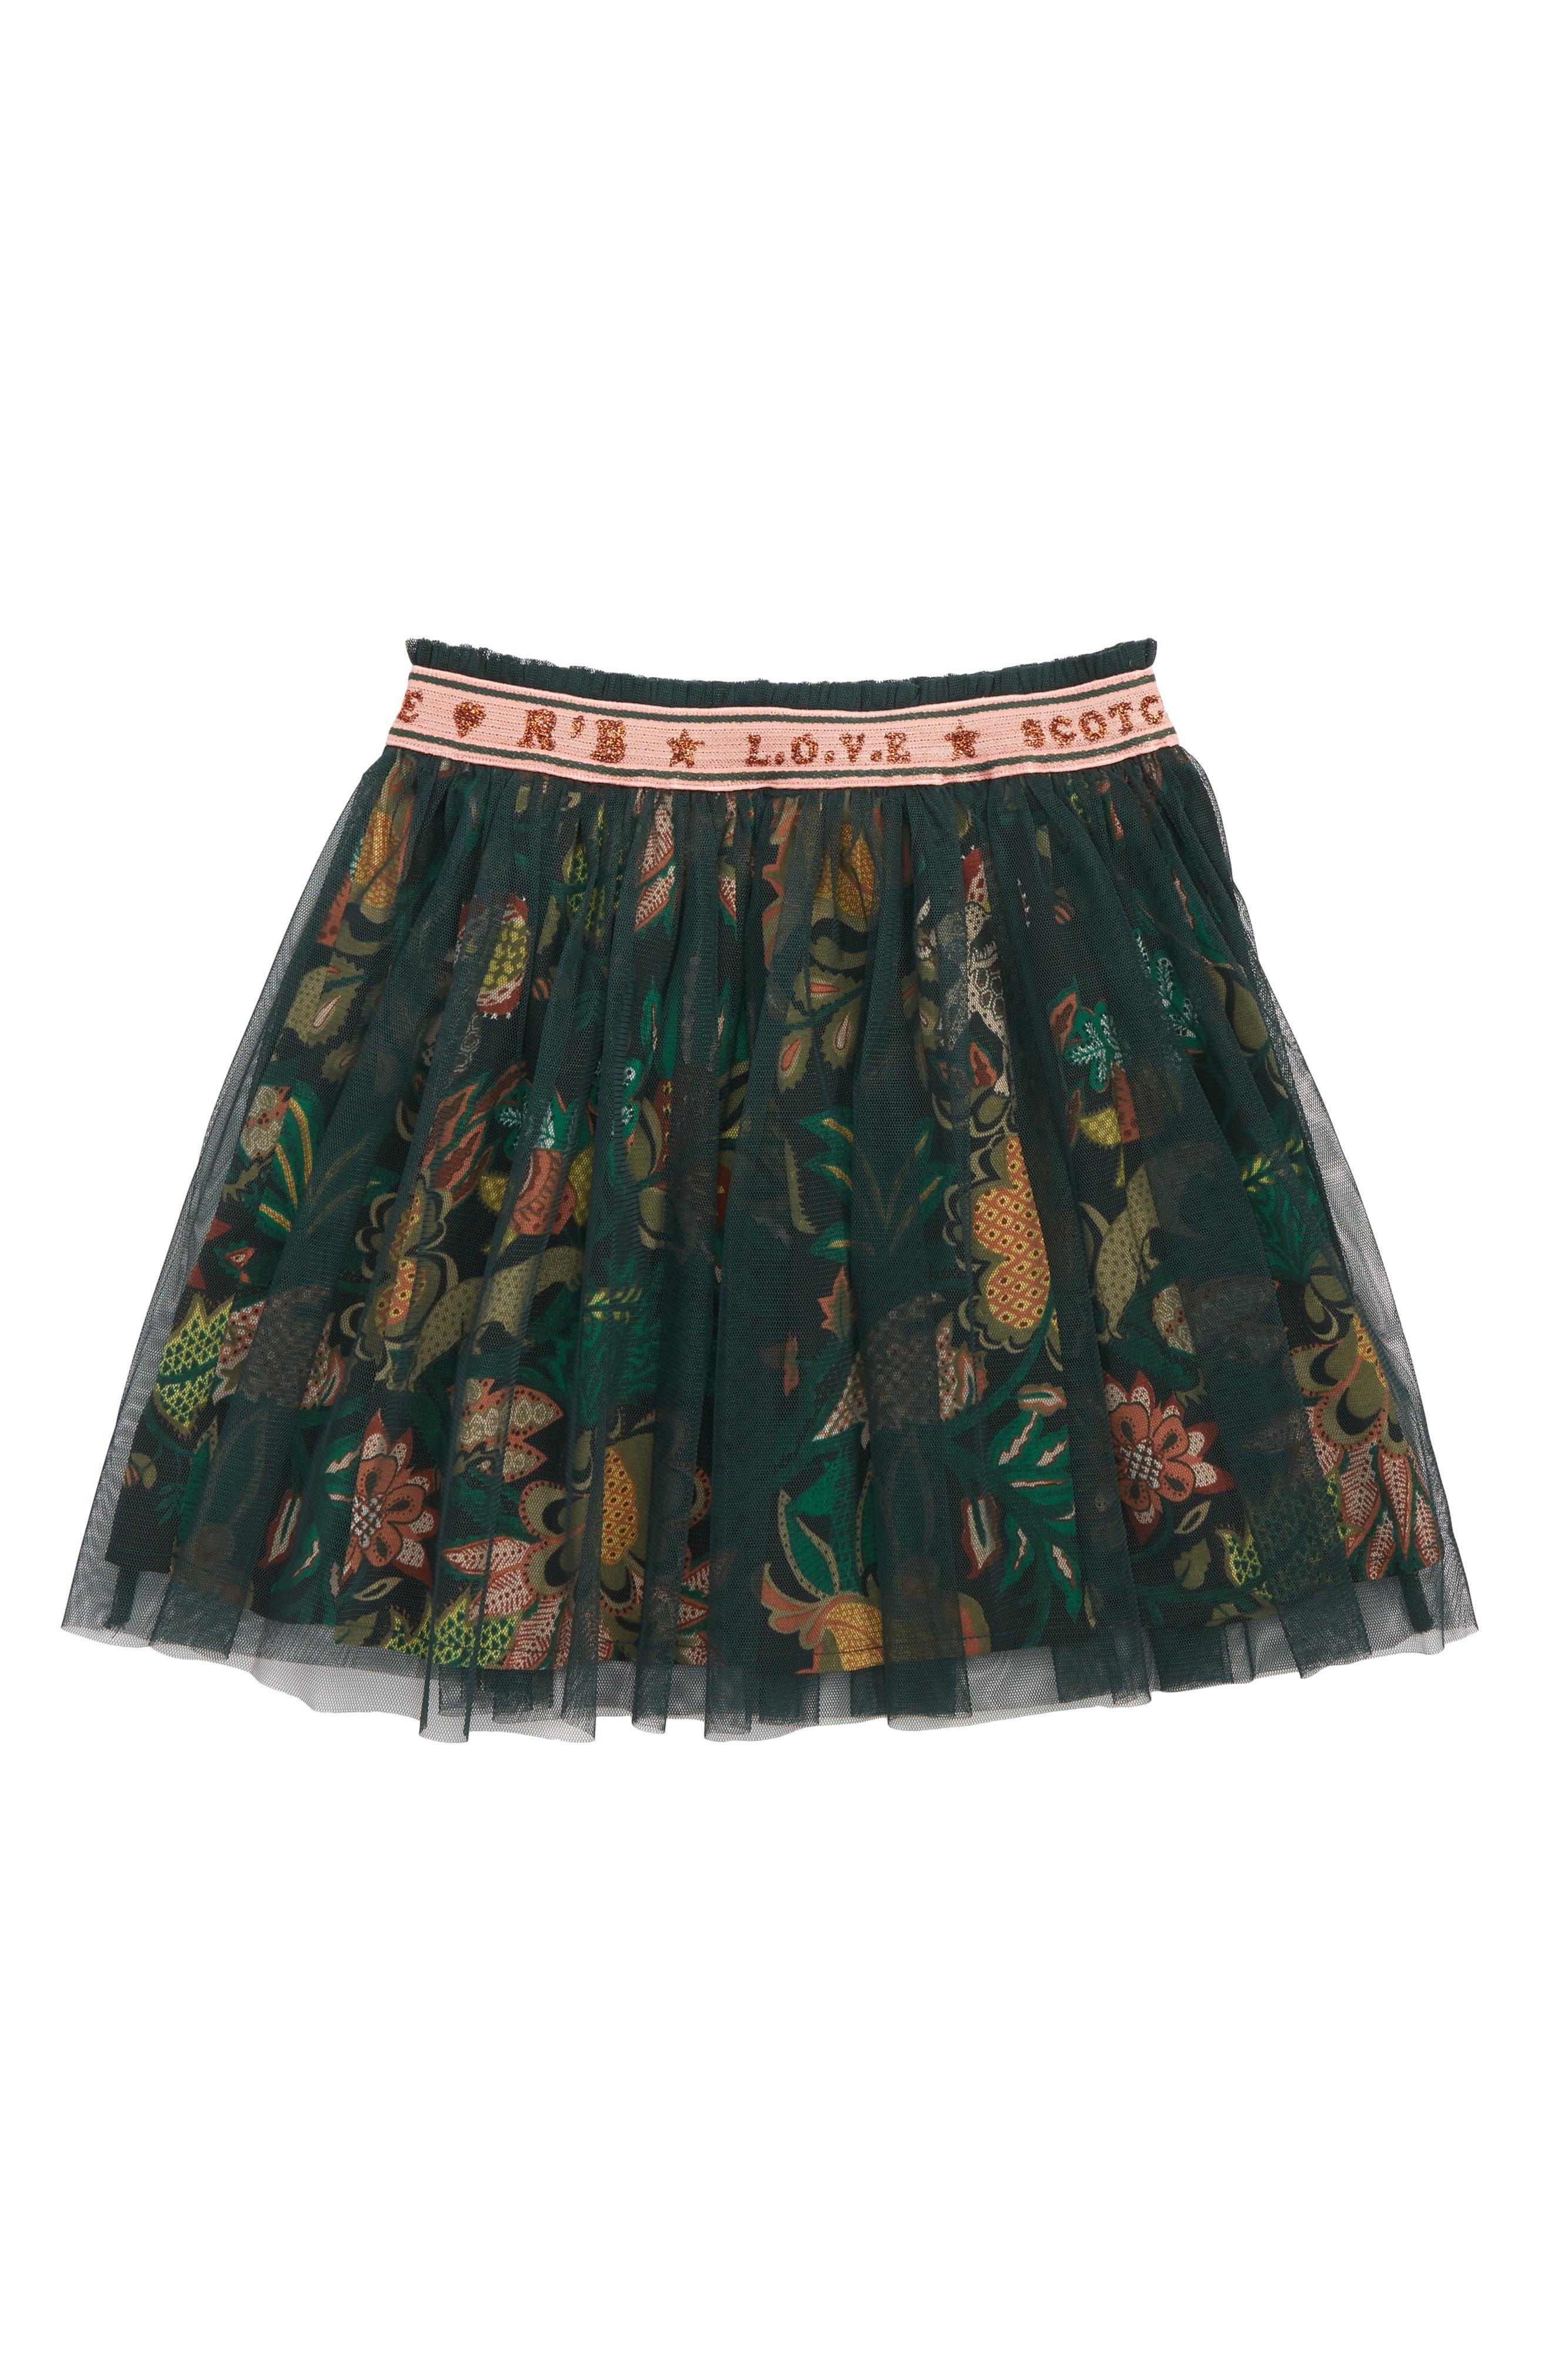 Scotch R'Belle Mesh Tutu Skirt,                         Main,                         color, BLACK AND GREEN FLORAL